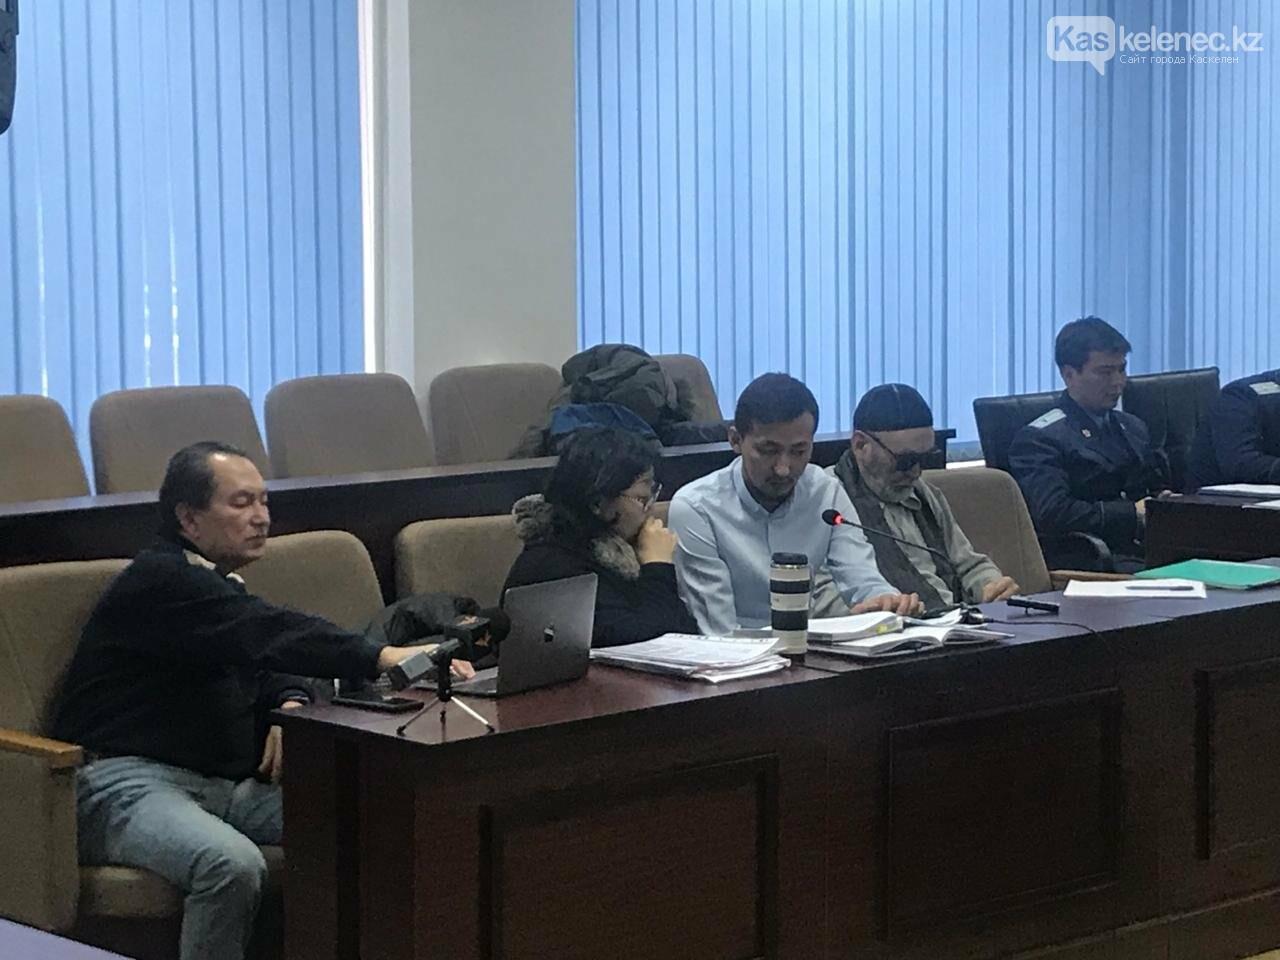 Убийство Дениса Тена: суд решил огласить приговор 17 января, фото-4